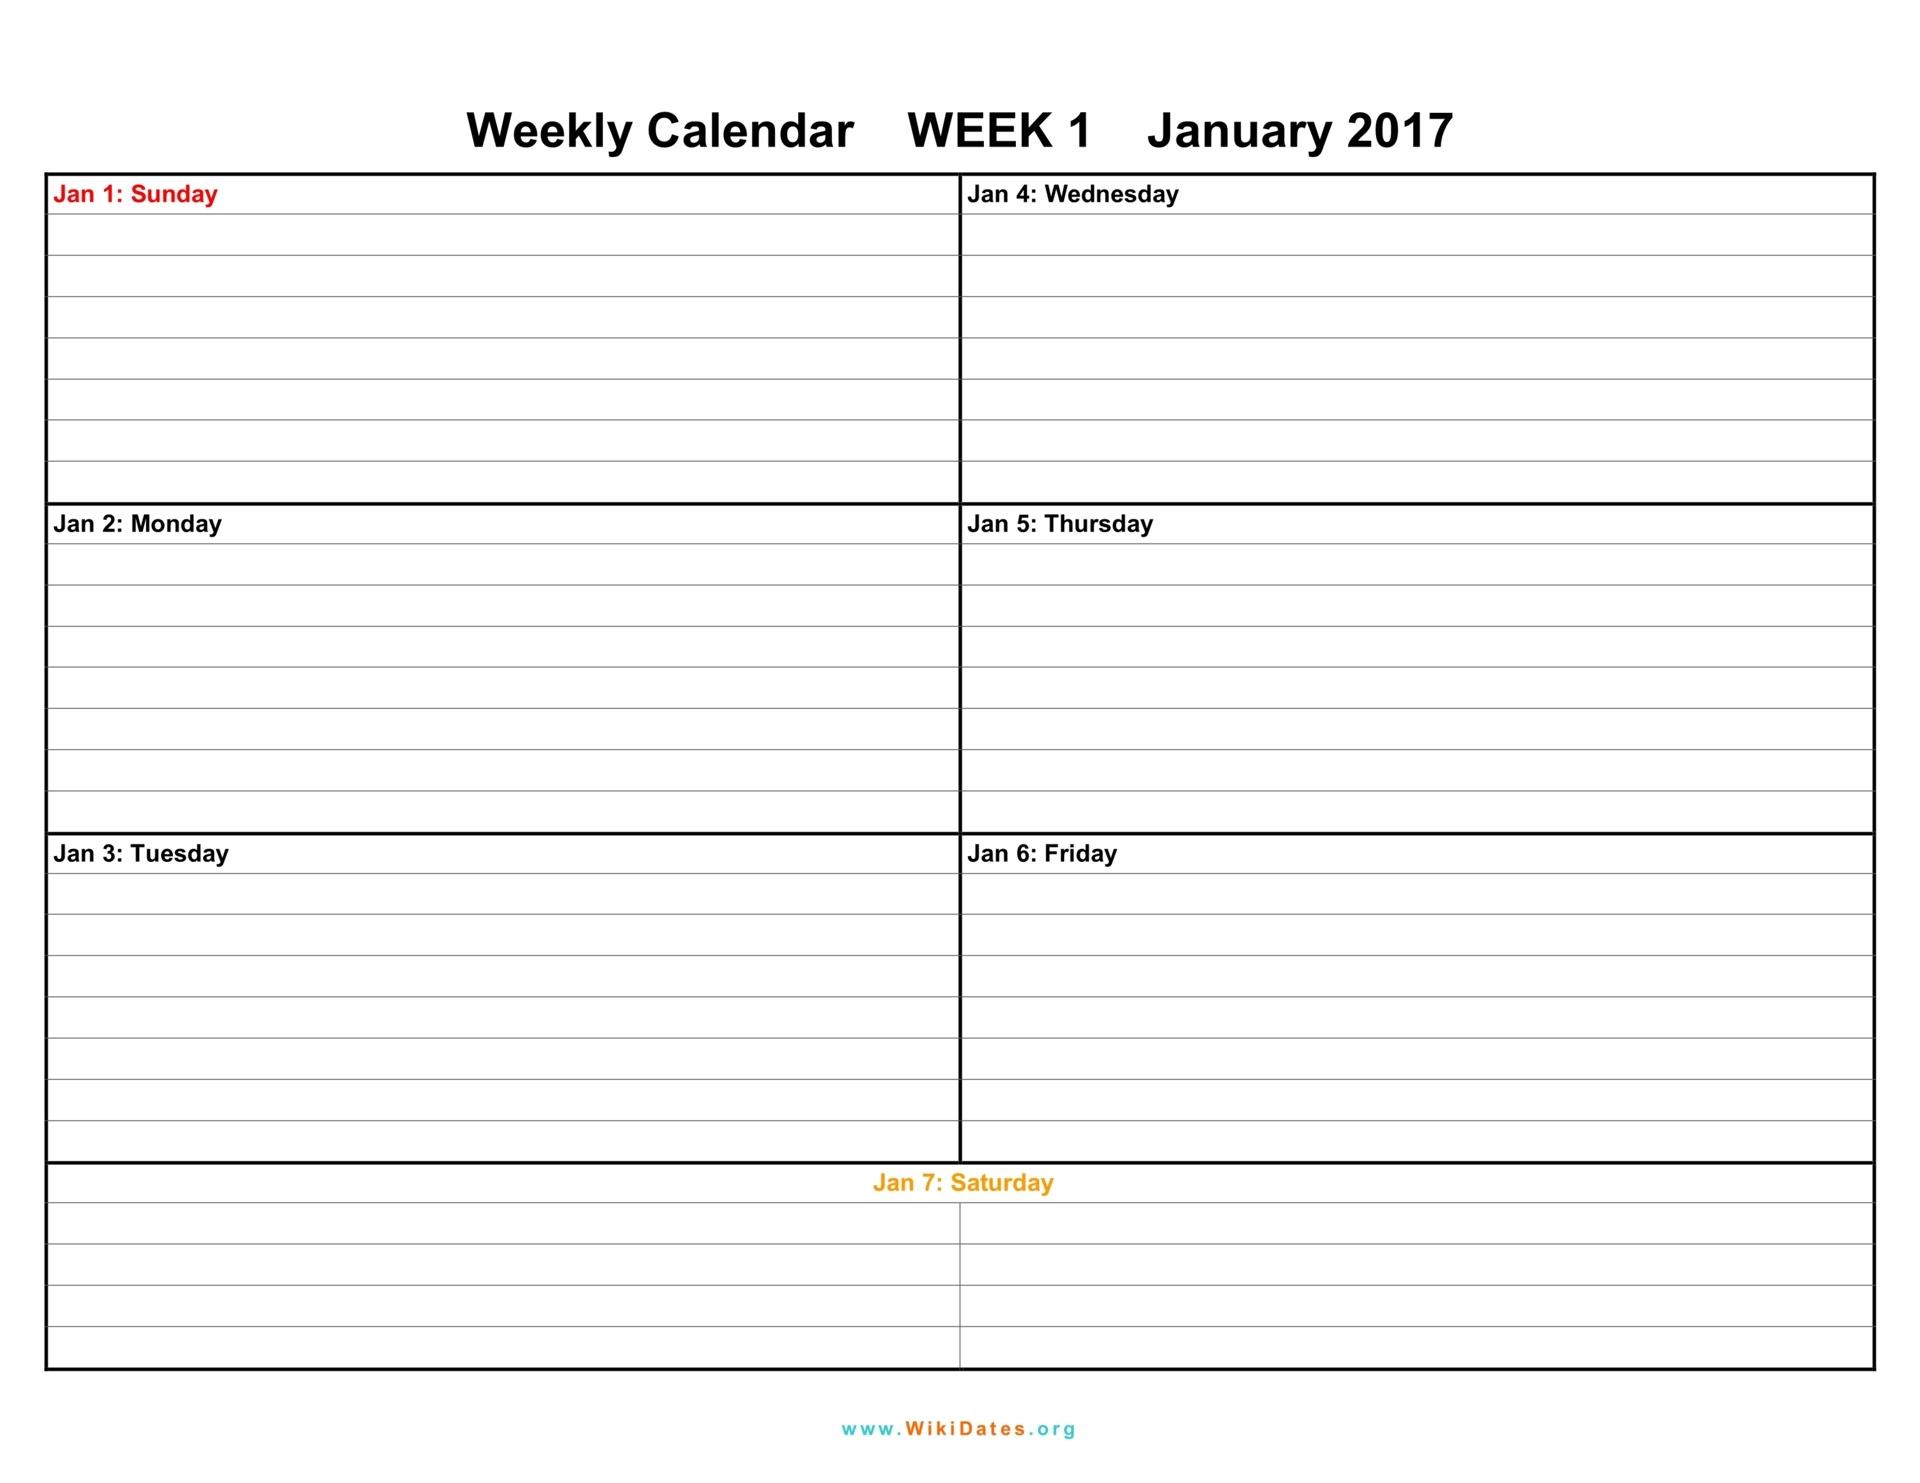 Weekly Calendar Template 2017 – 2017 calendar 2017